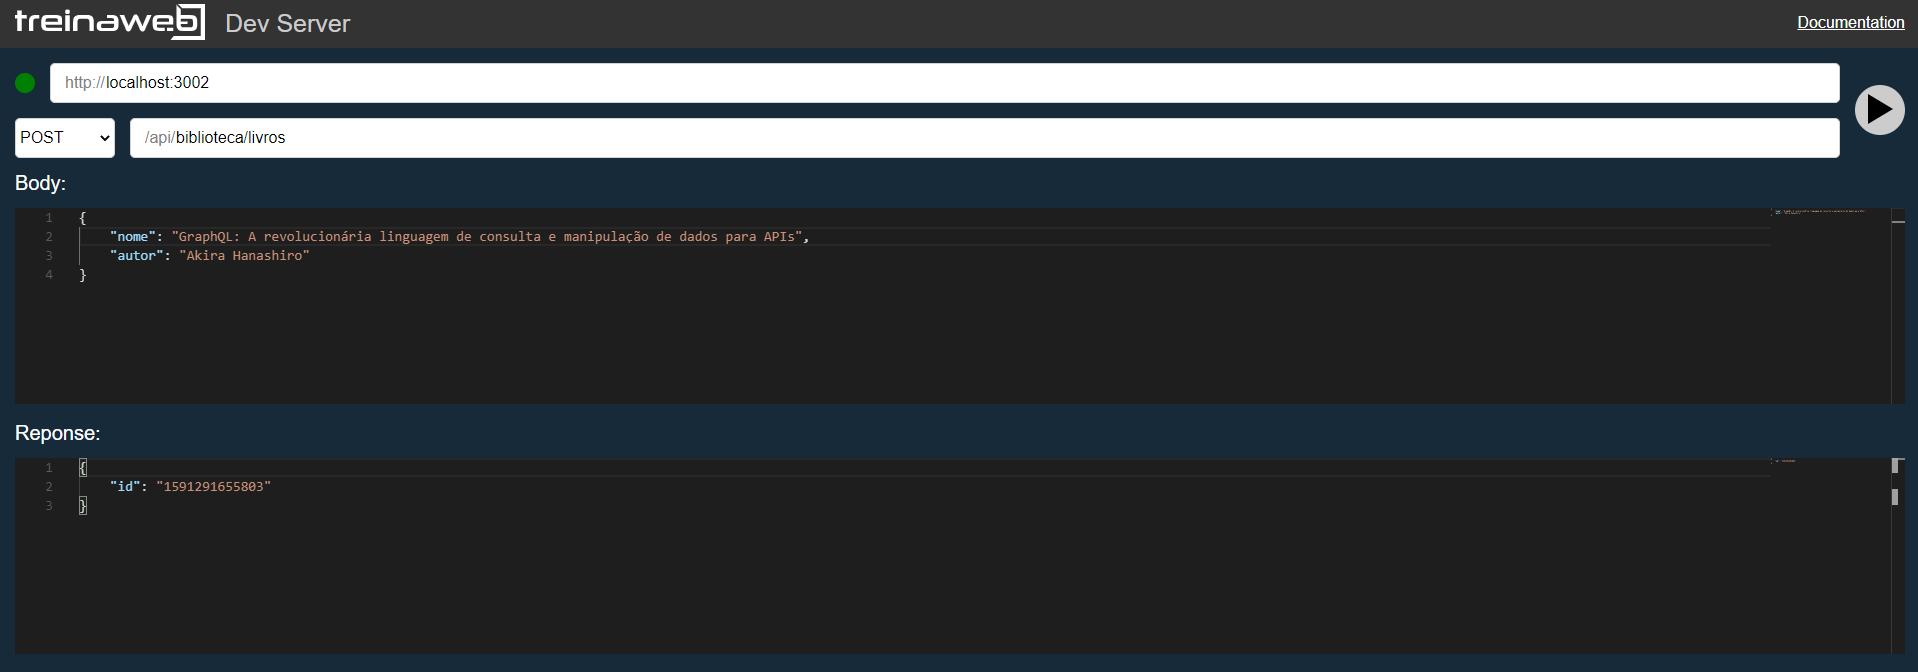 Tw Dev Server - Post